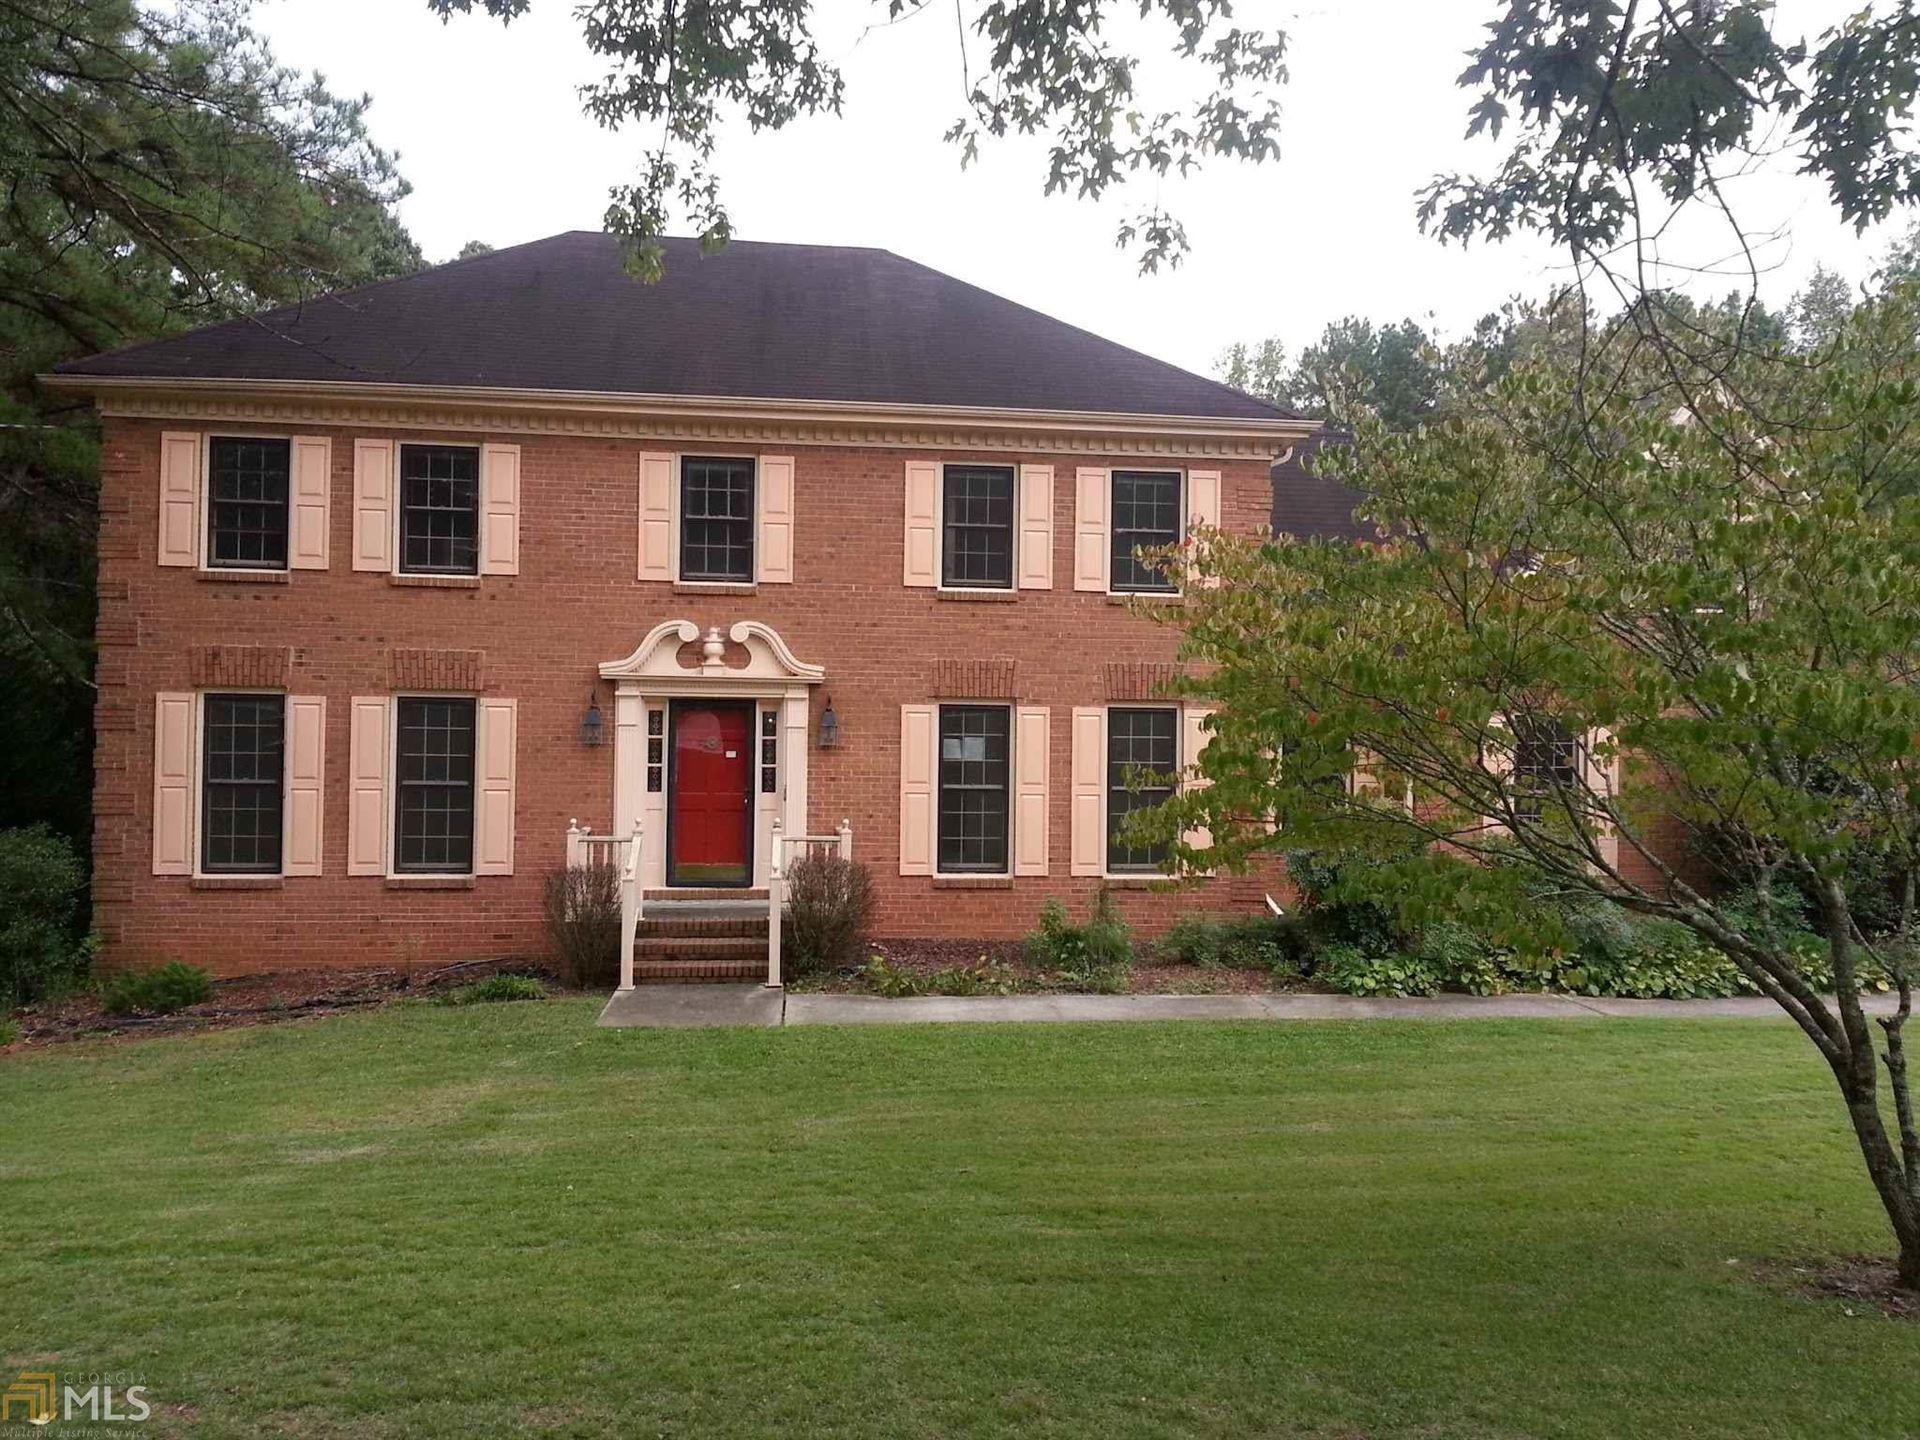 3442 Inns Brook, Snellville, GA 30039 - MLS#: 8427458